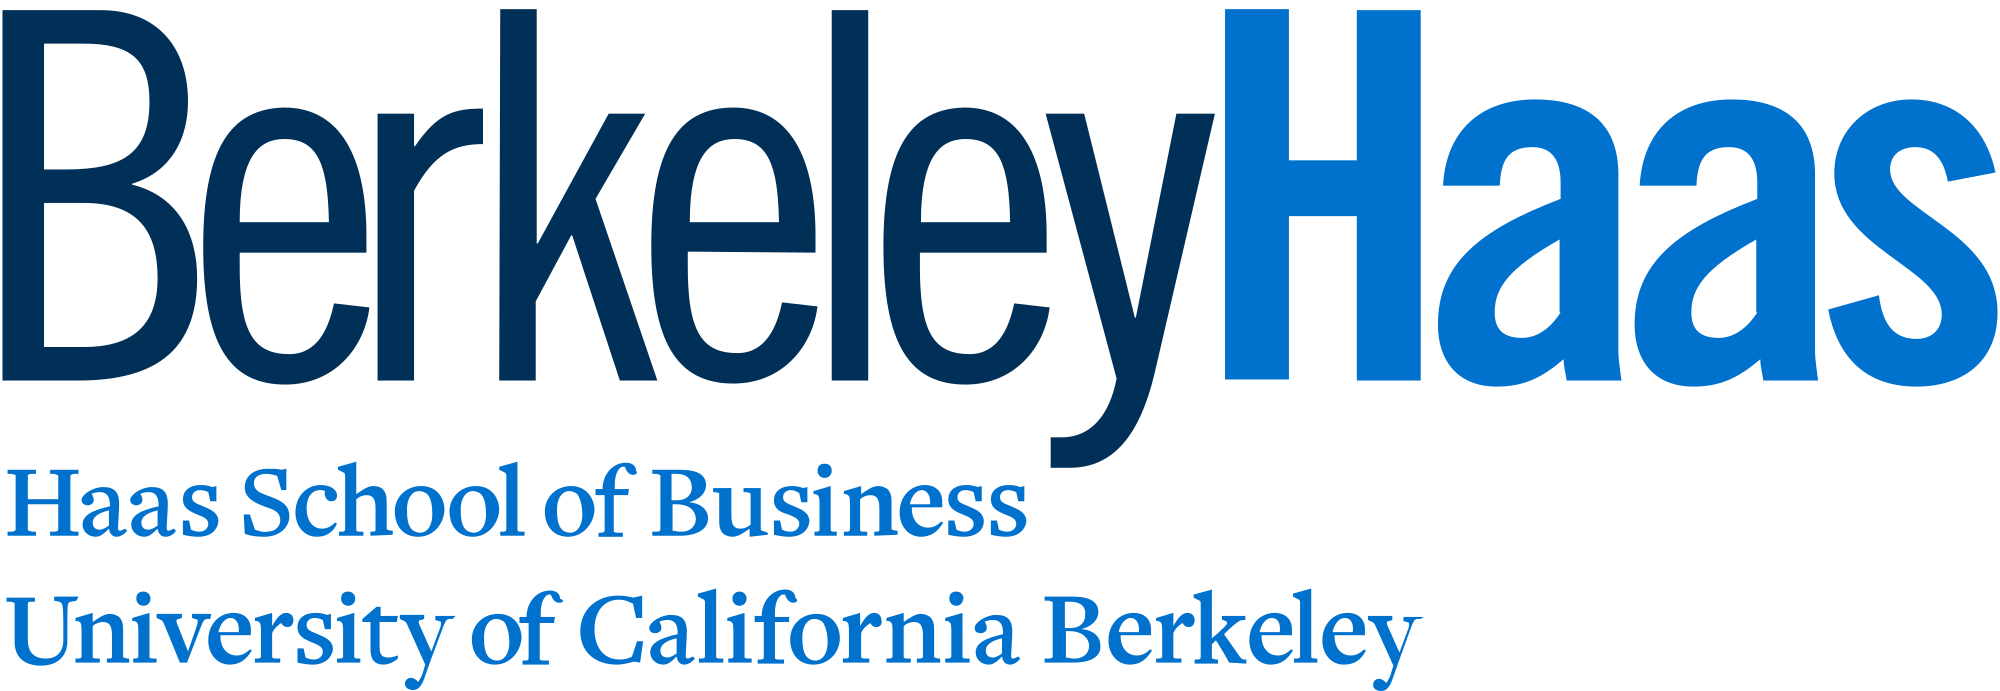 Berkeley Business Academy For Youth Berkeley Haas Business School Logo Berkeley Haas University Of California